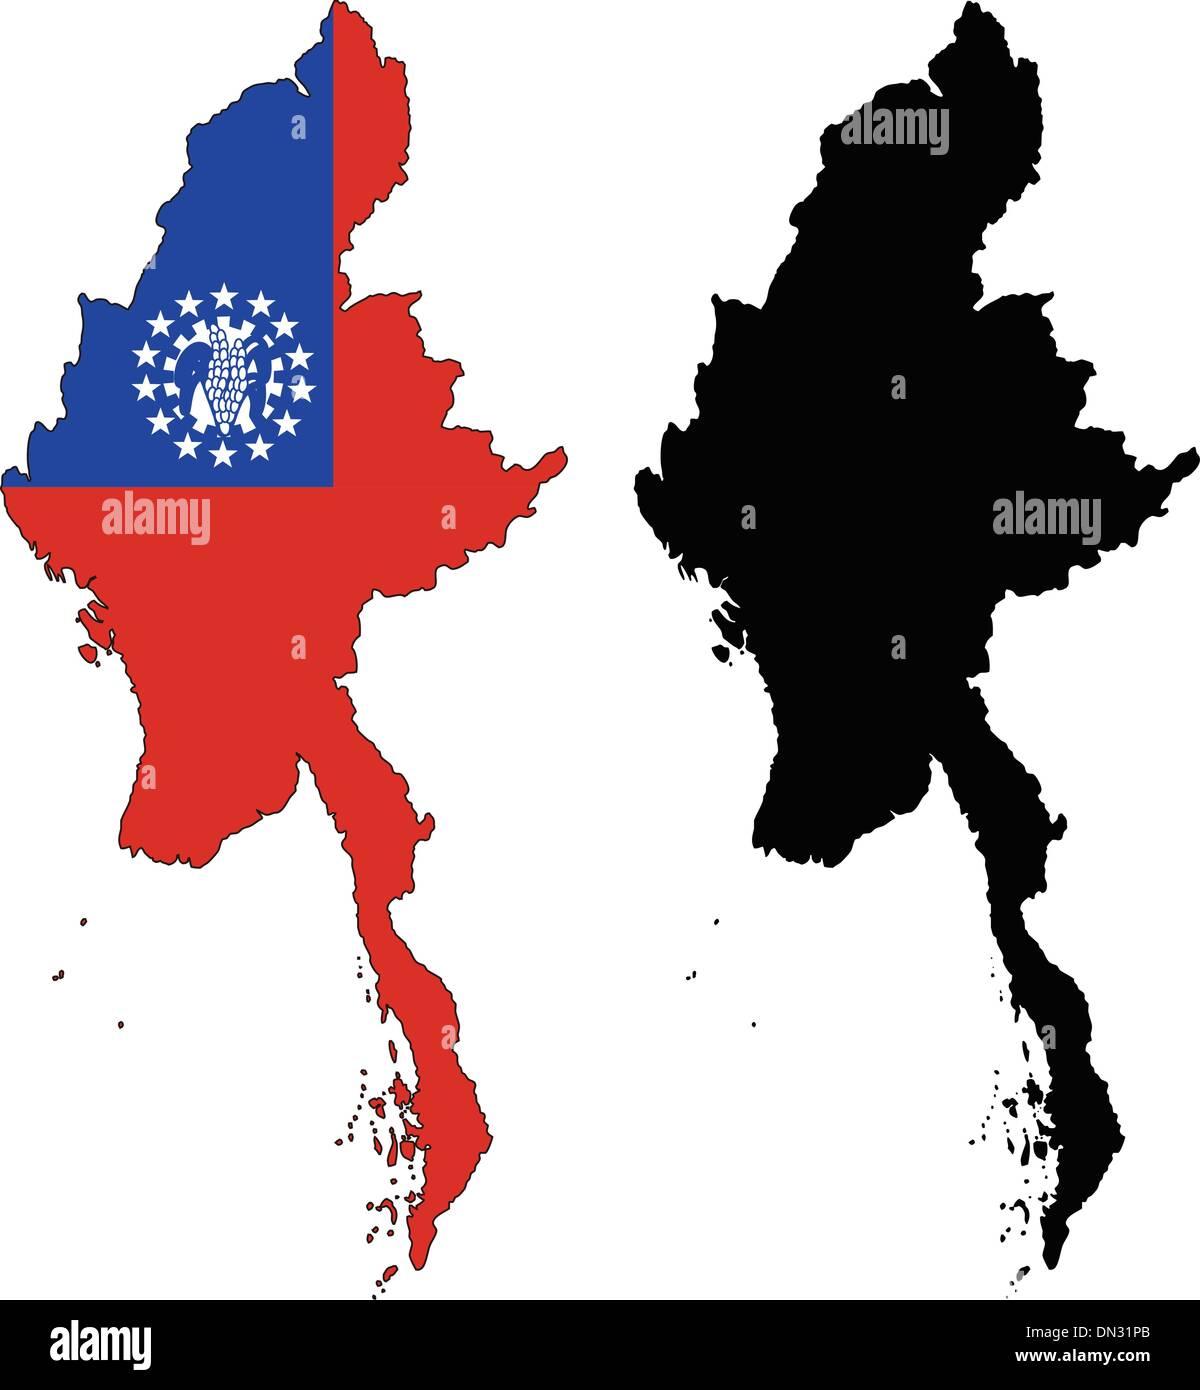 Myanmar - Stock Vector